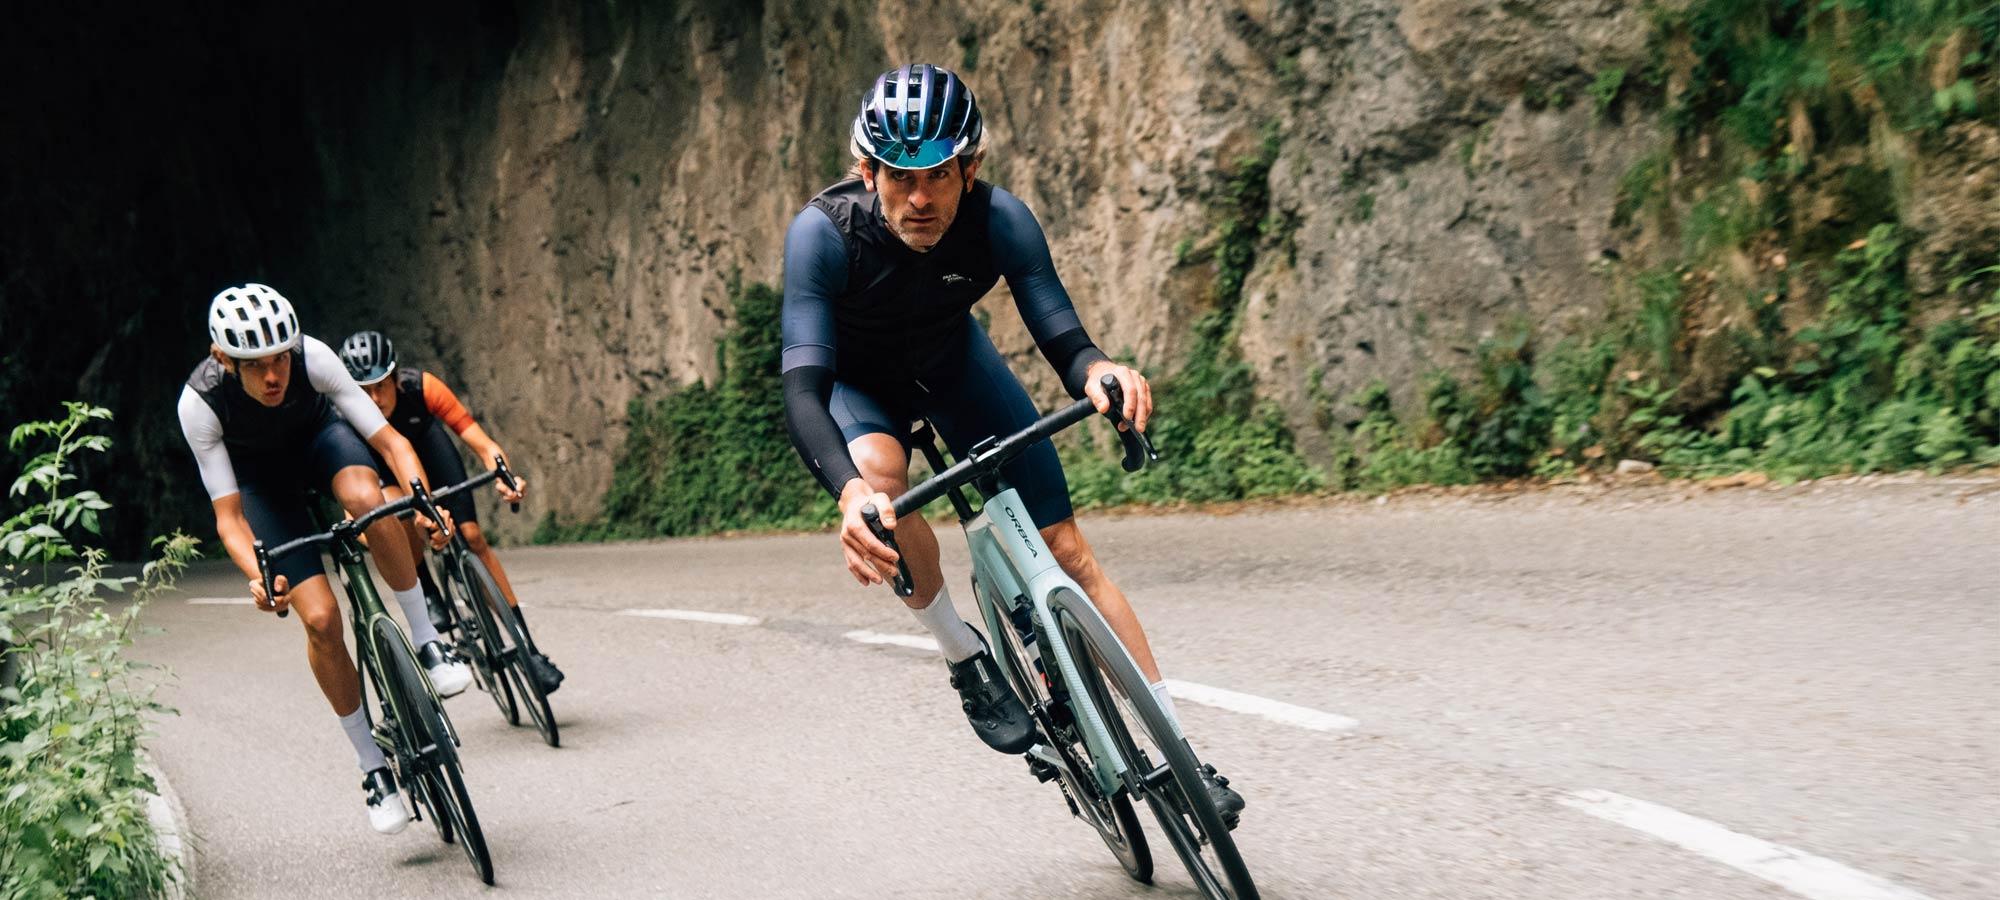 Orbea Bikes e-bike's powerful motor